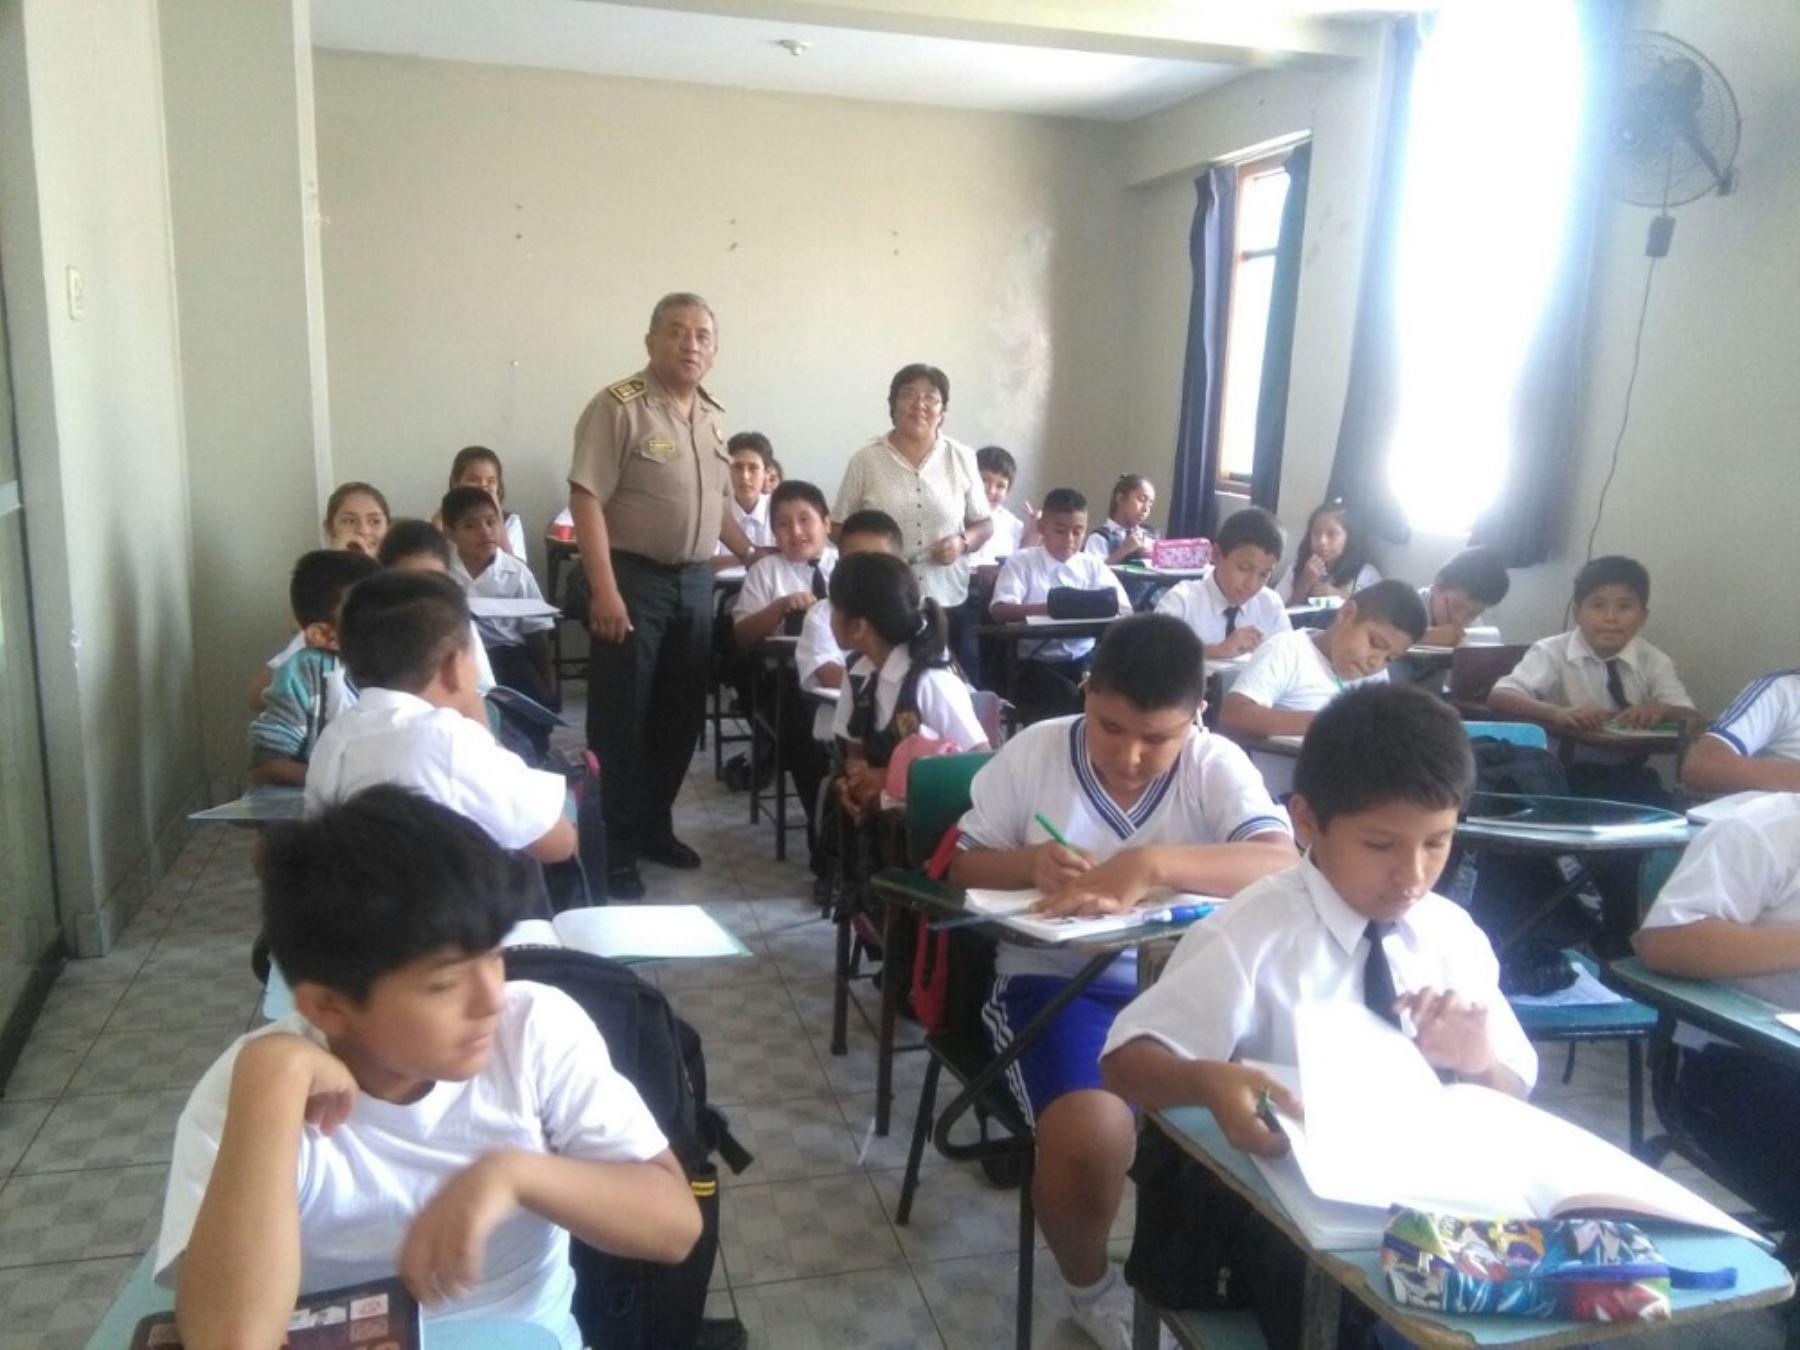 Escolares de trujillo acuden a clases en comisar a de la for Ministerio del interior comisarias